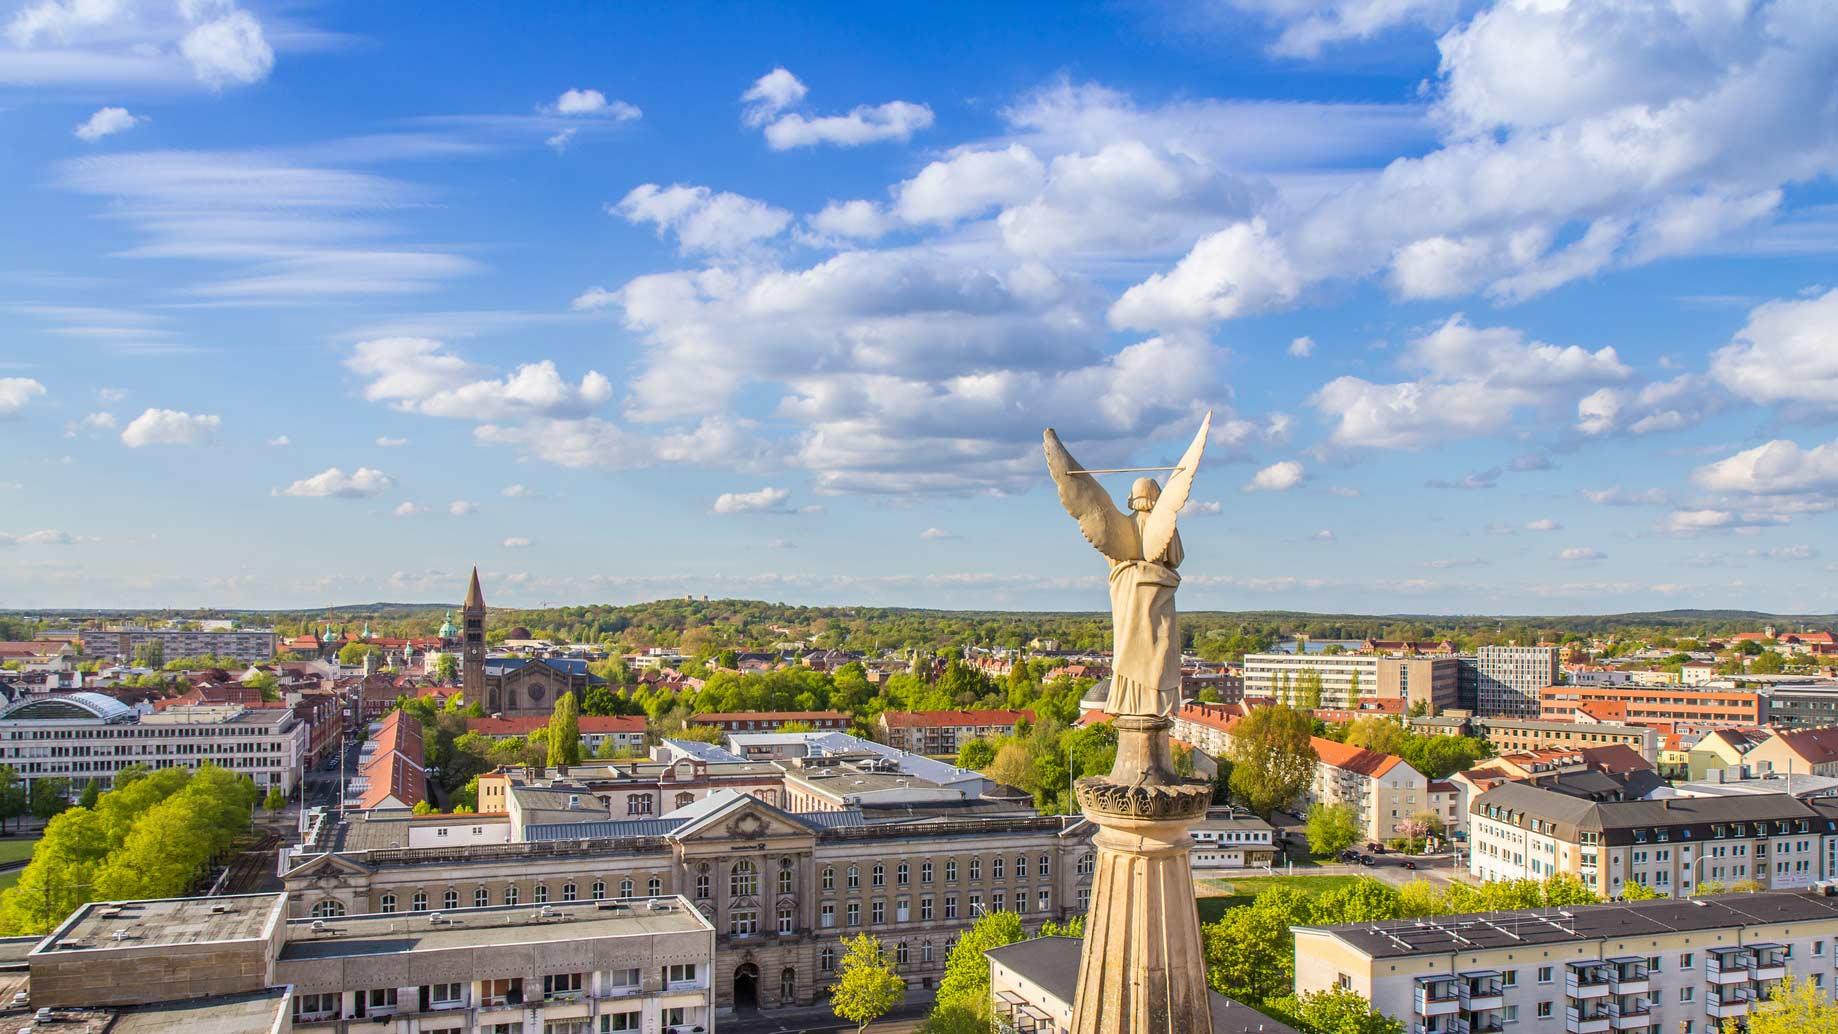 Immobilien-Potsdam Vogelperspektive